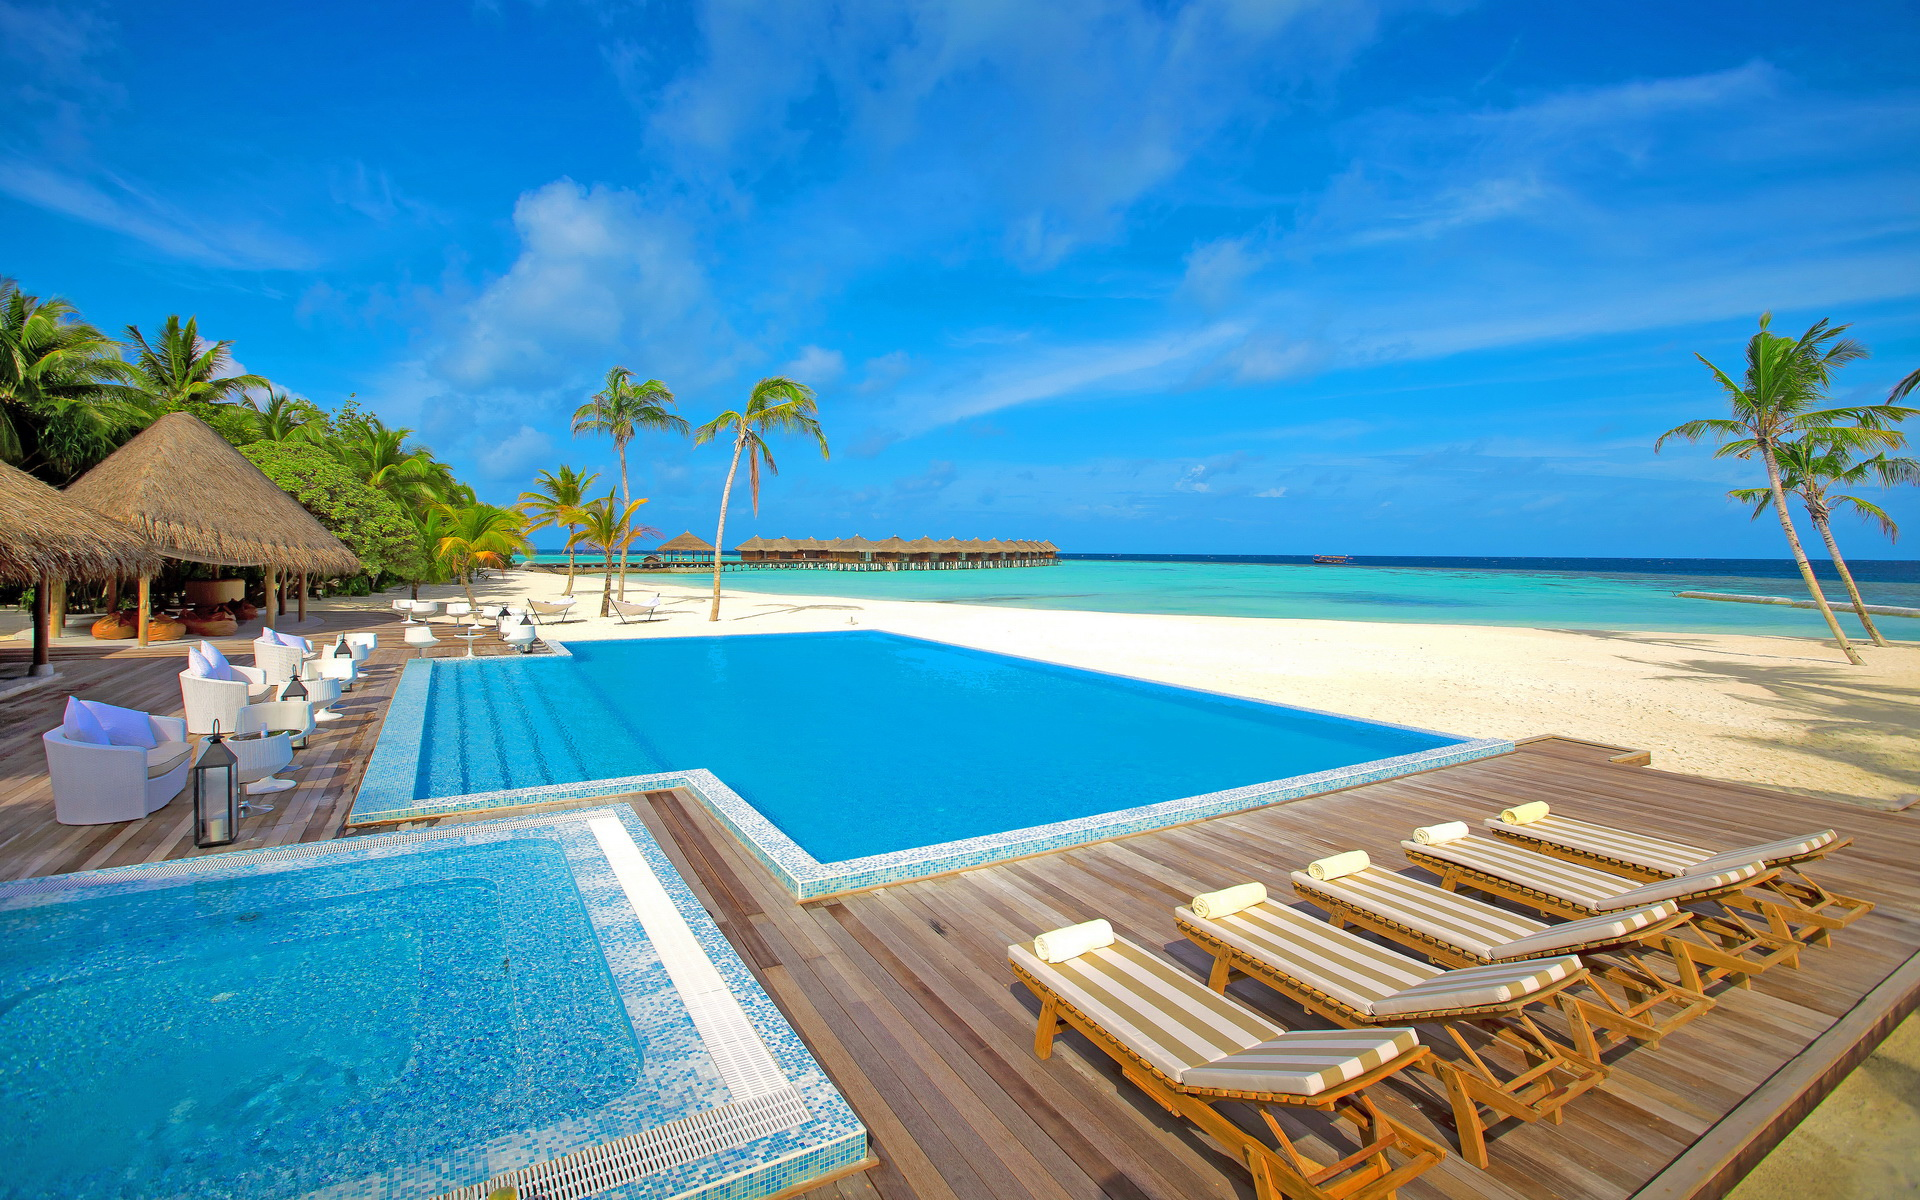 Maldives Resort Pool